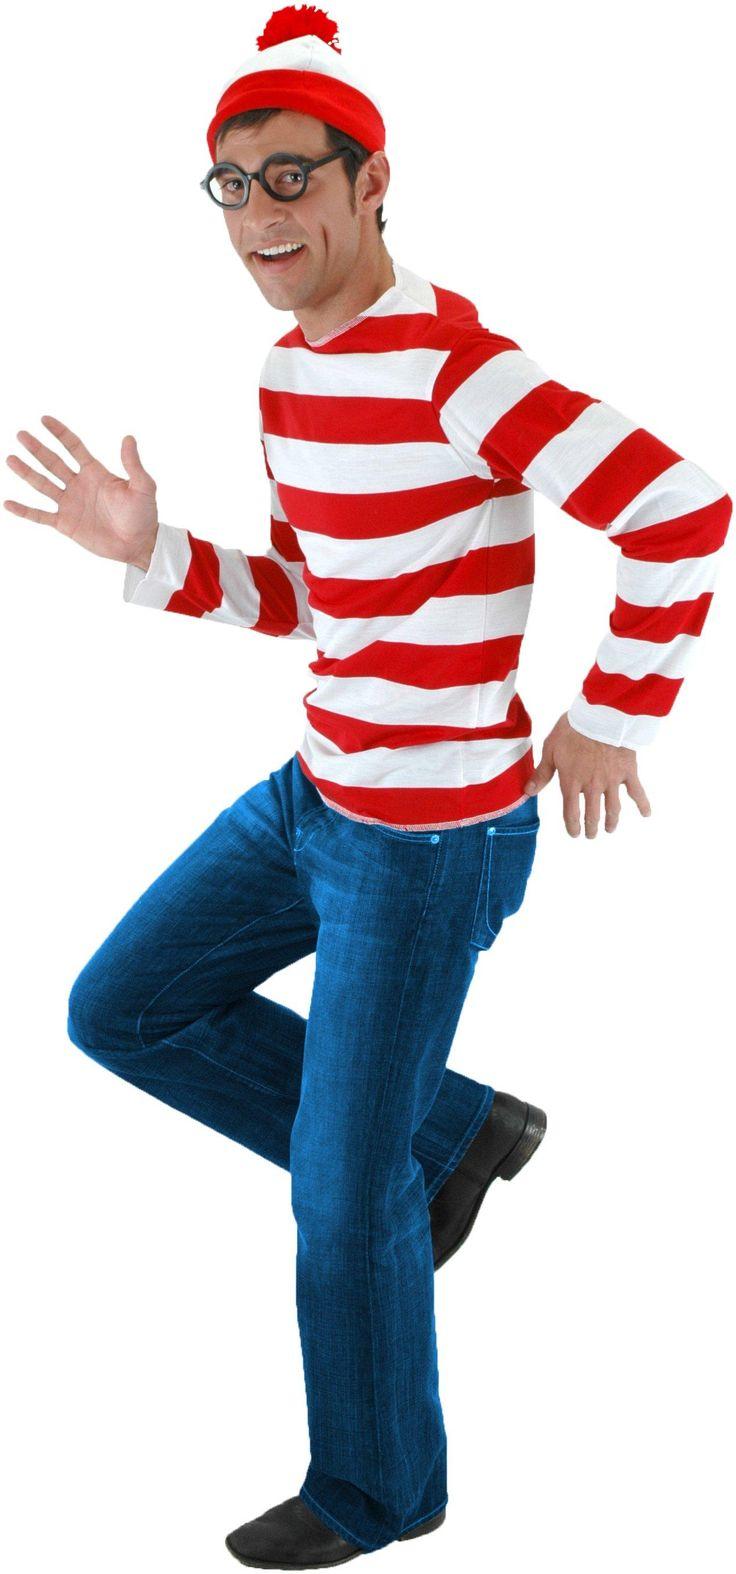 Where's Waldo Costume Kit from Buycostumes.com